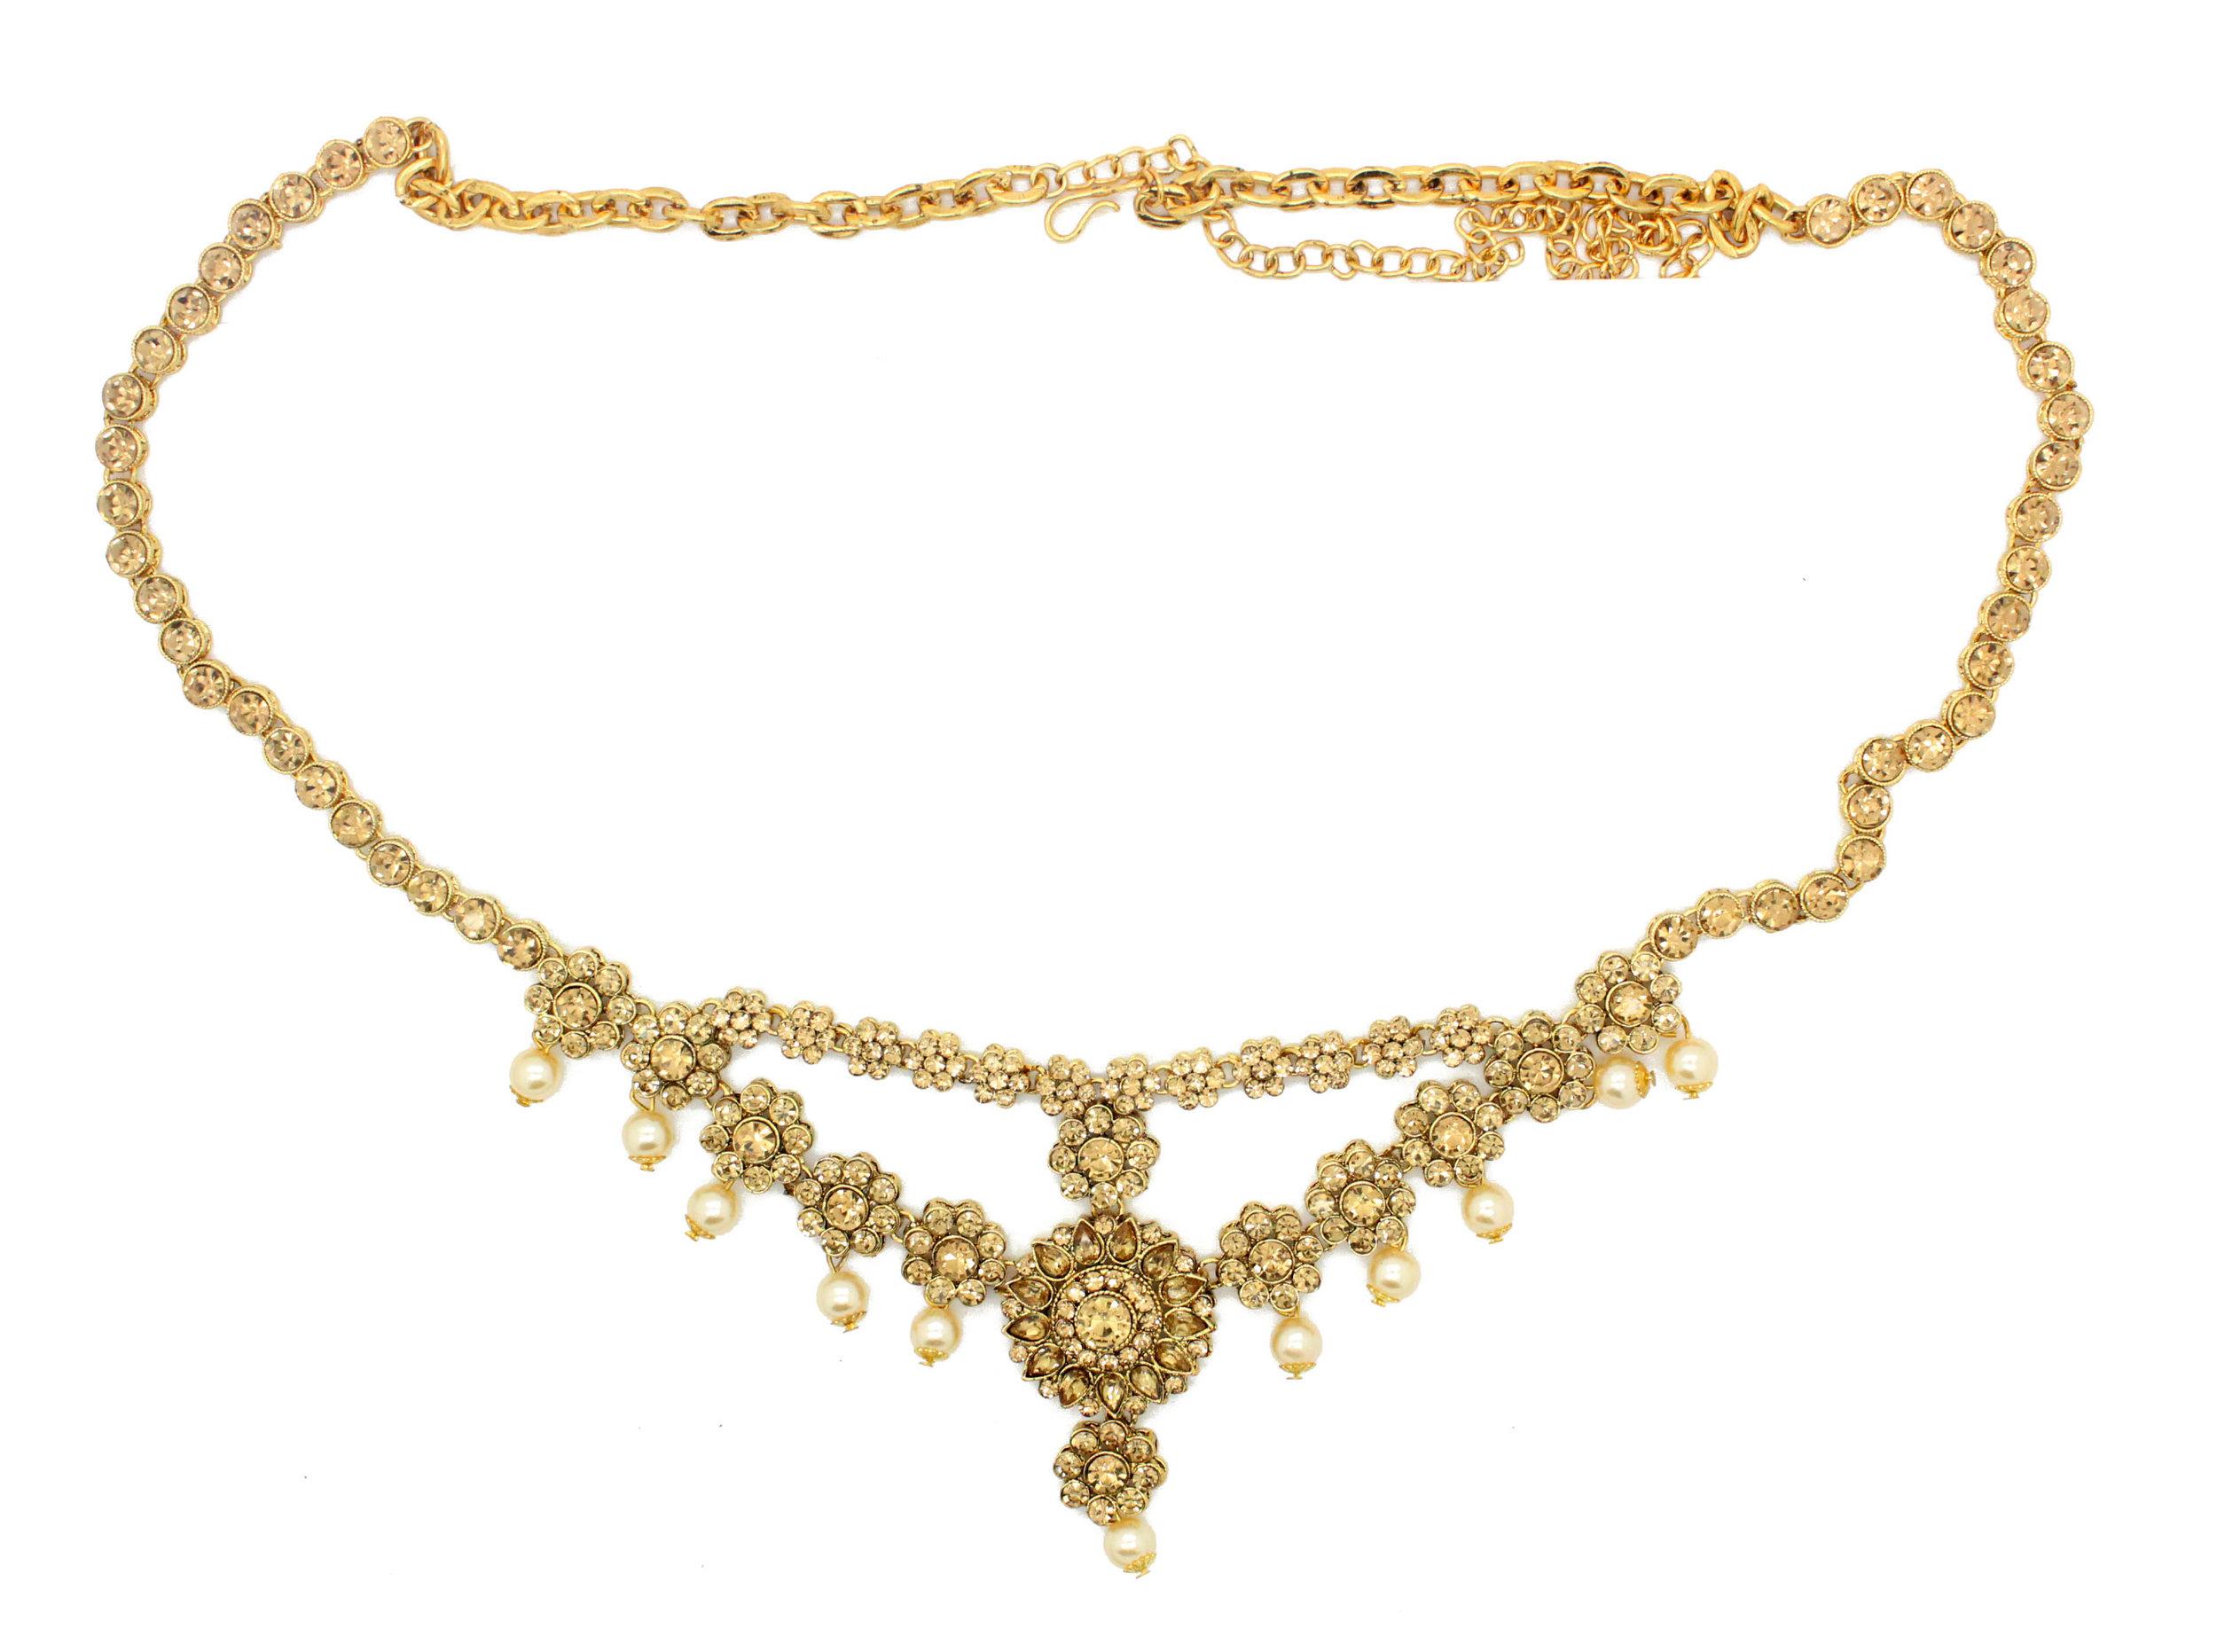 Aheli Ethnic Faux Stone Waist Charm Jewelry Kamar Patta Belly Chain Indian Traditional Sari Saree Belt for Women